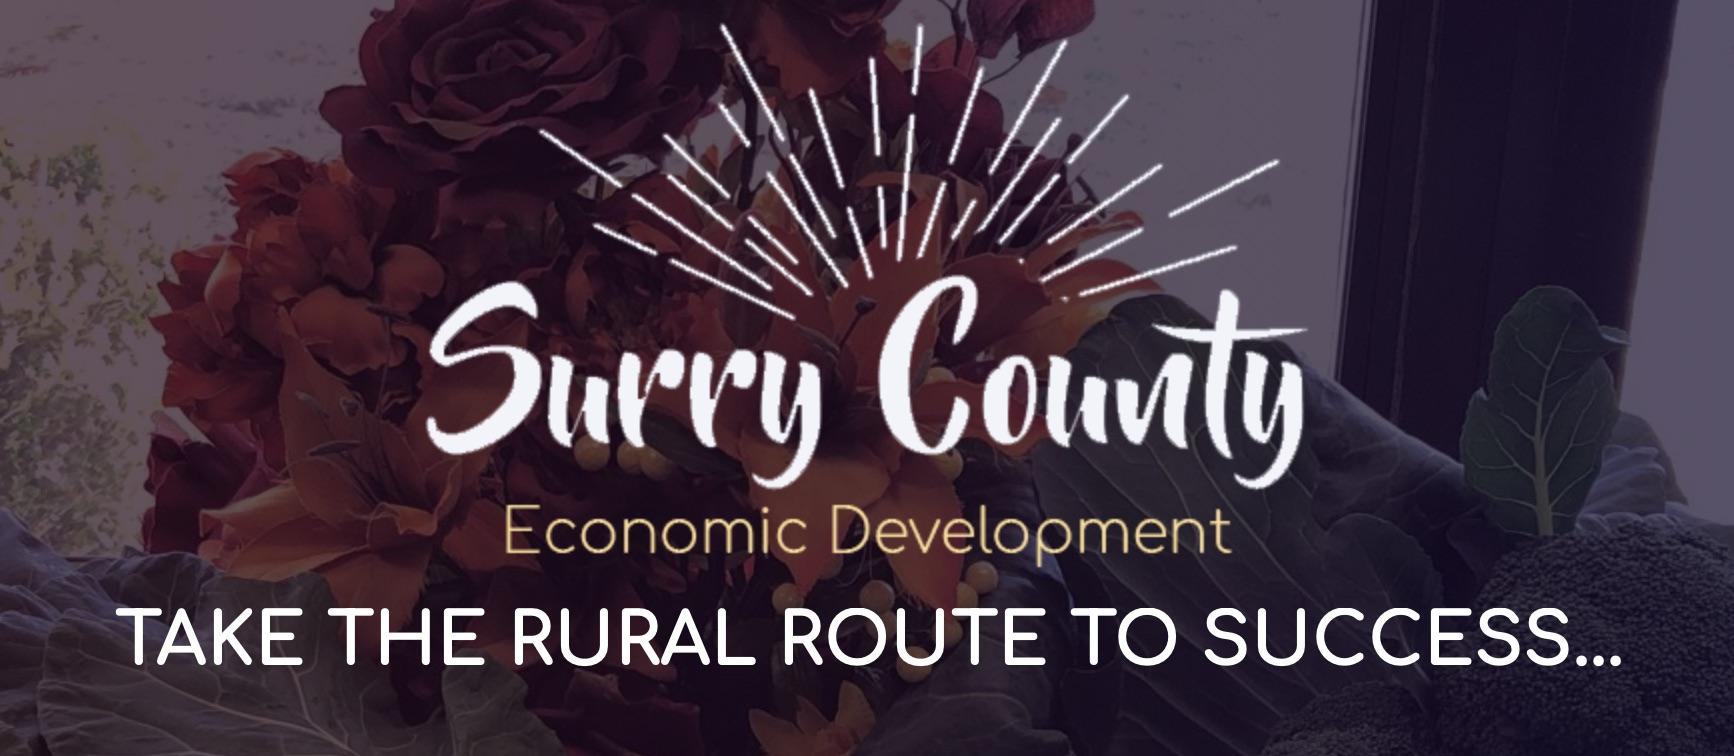 Surry County Virginia Economic Development marketing collateral copywriting Tryna Fitzpatrick